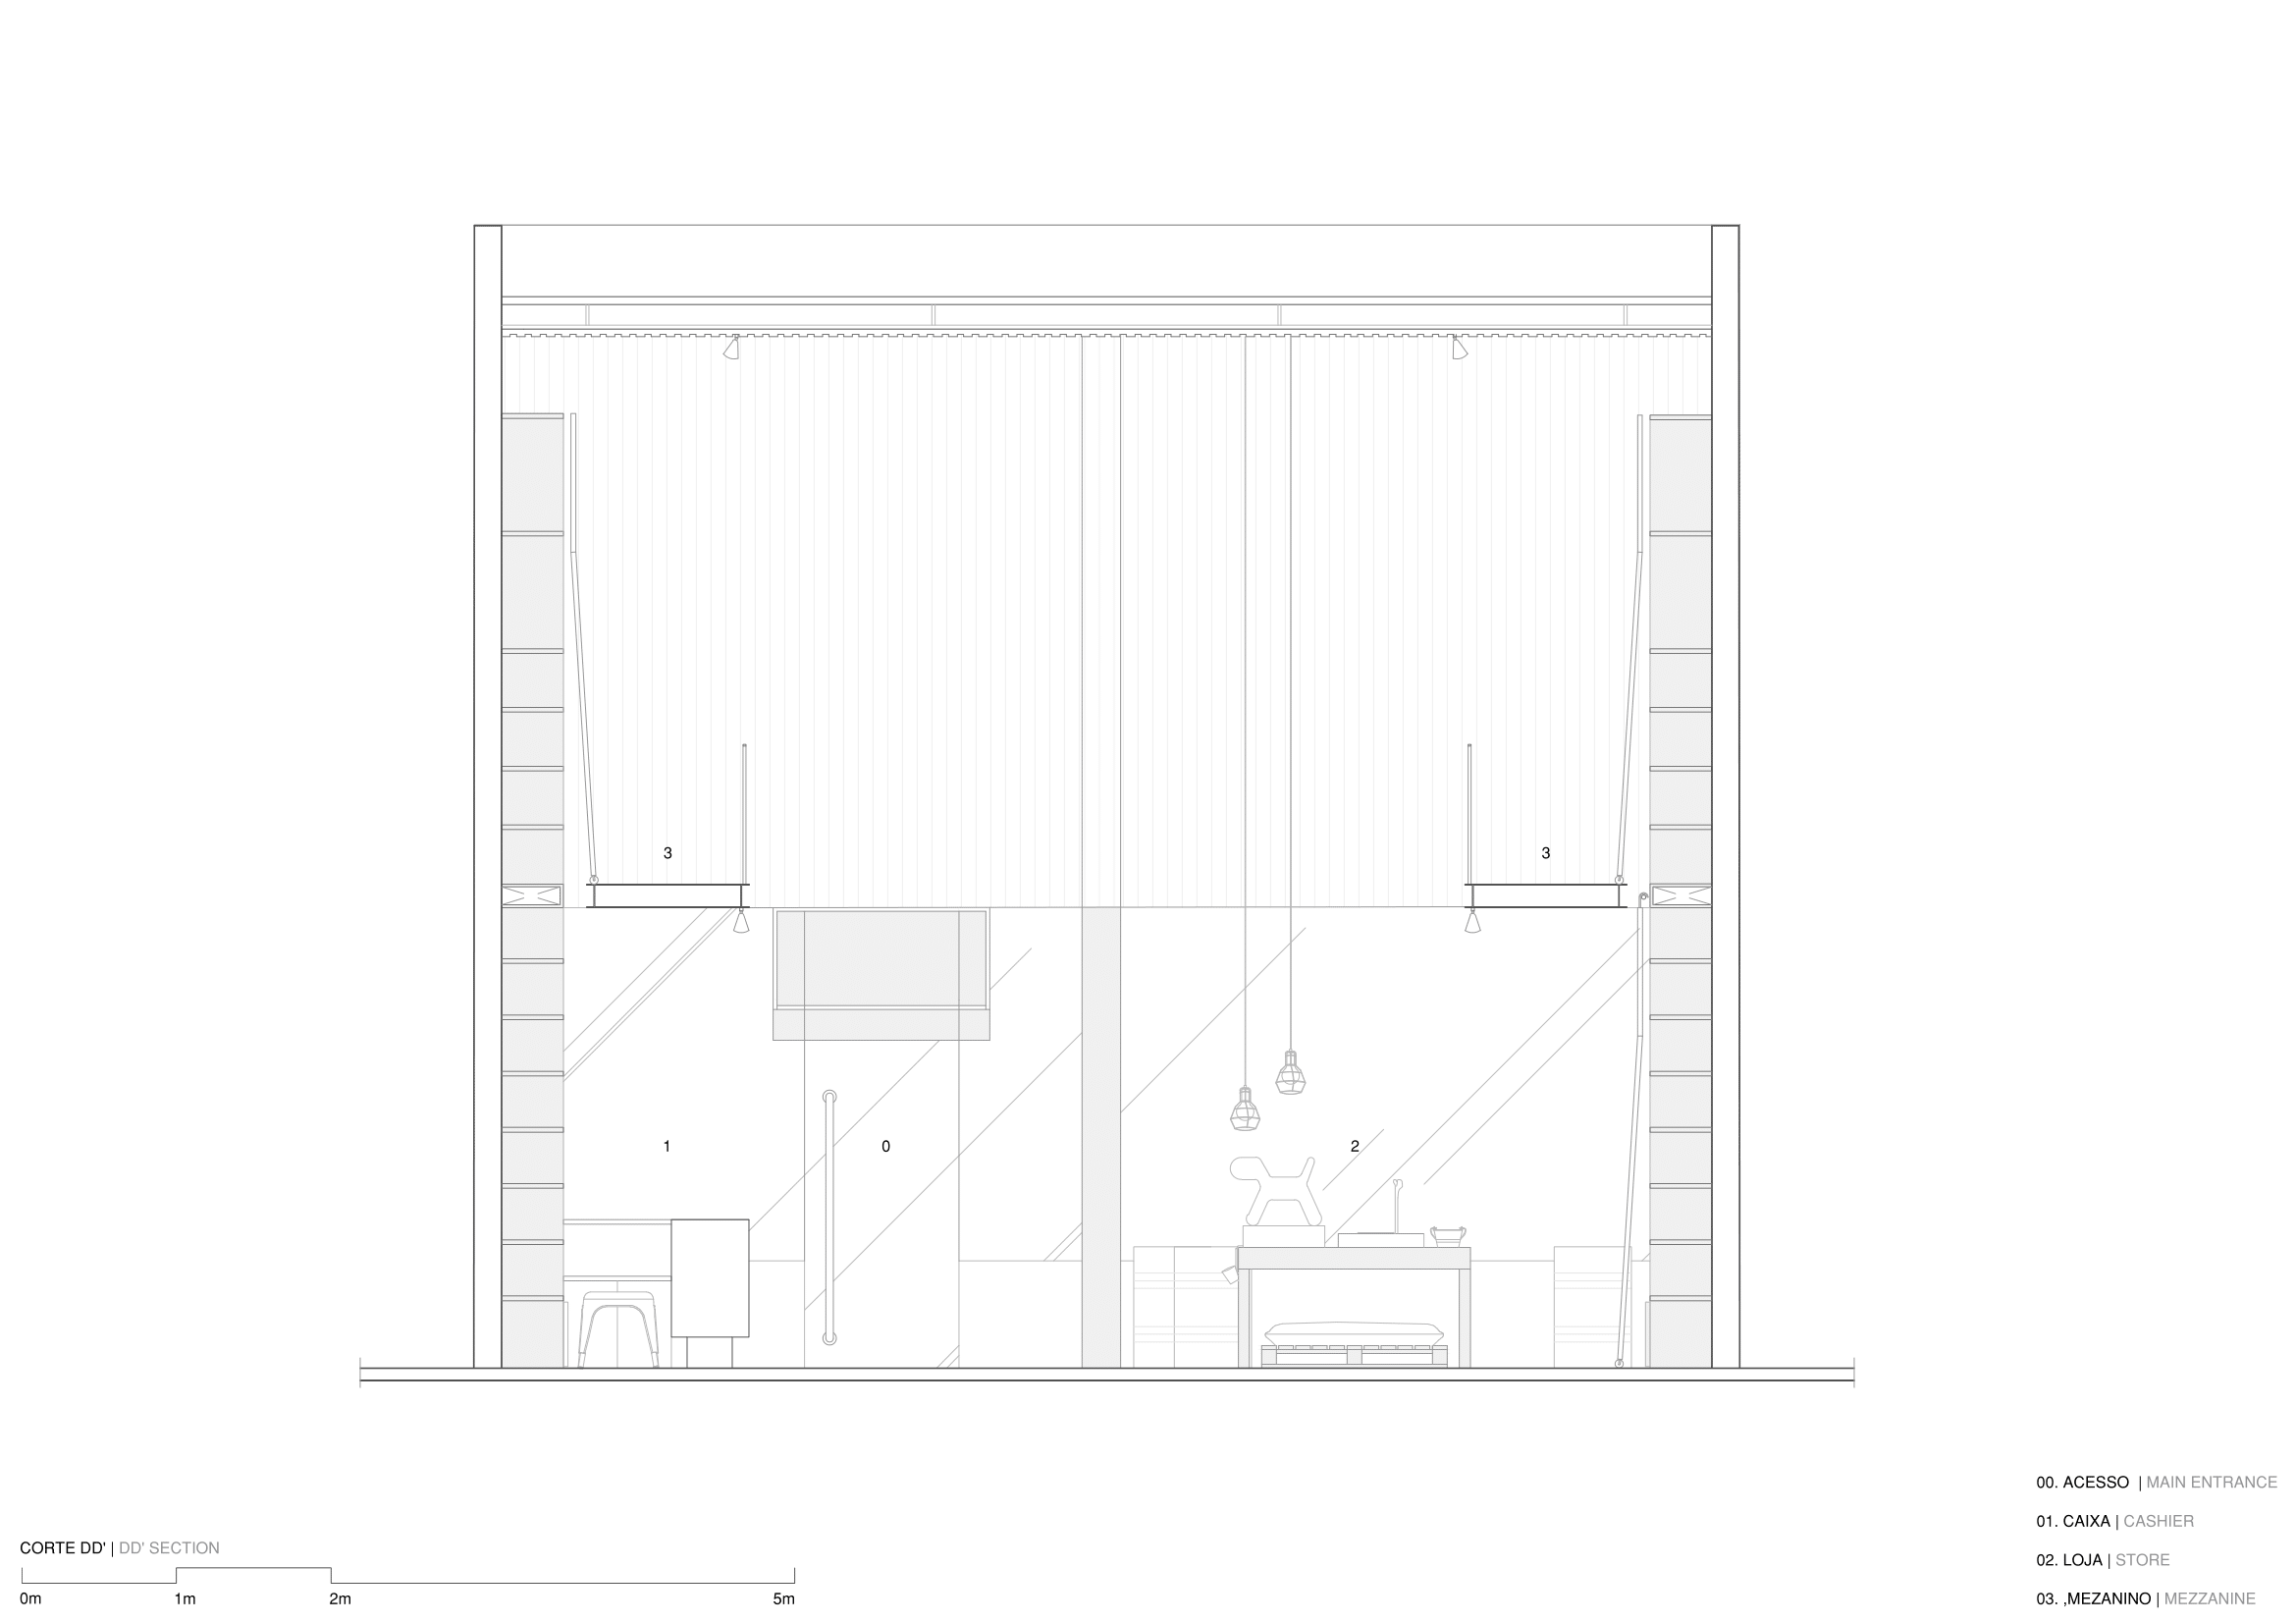 hobjeto-arquitetura-loja-maniadebicho-ap-07-cortedd